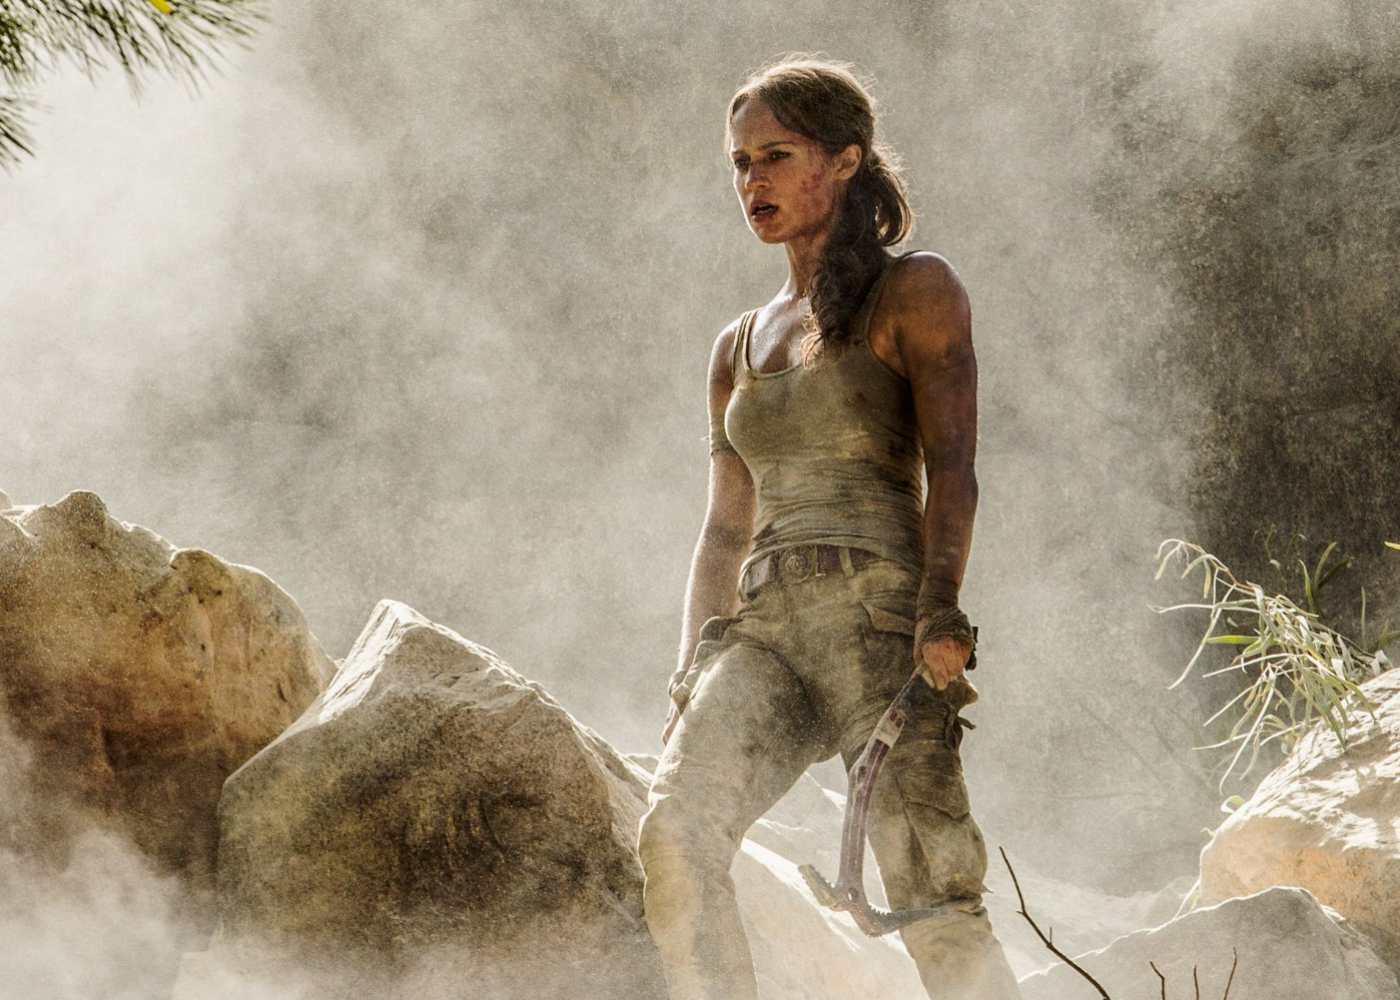 Alicia Vikander Defies Death in New Tomb Raider Trailer